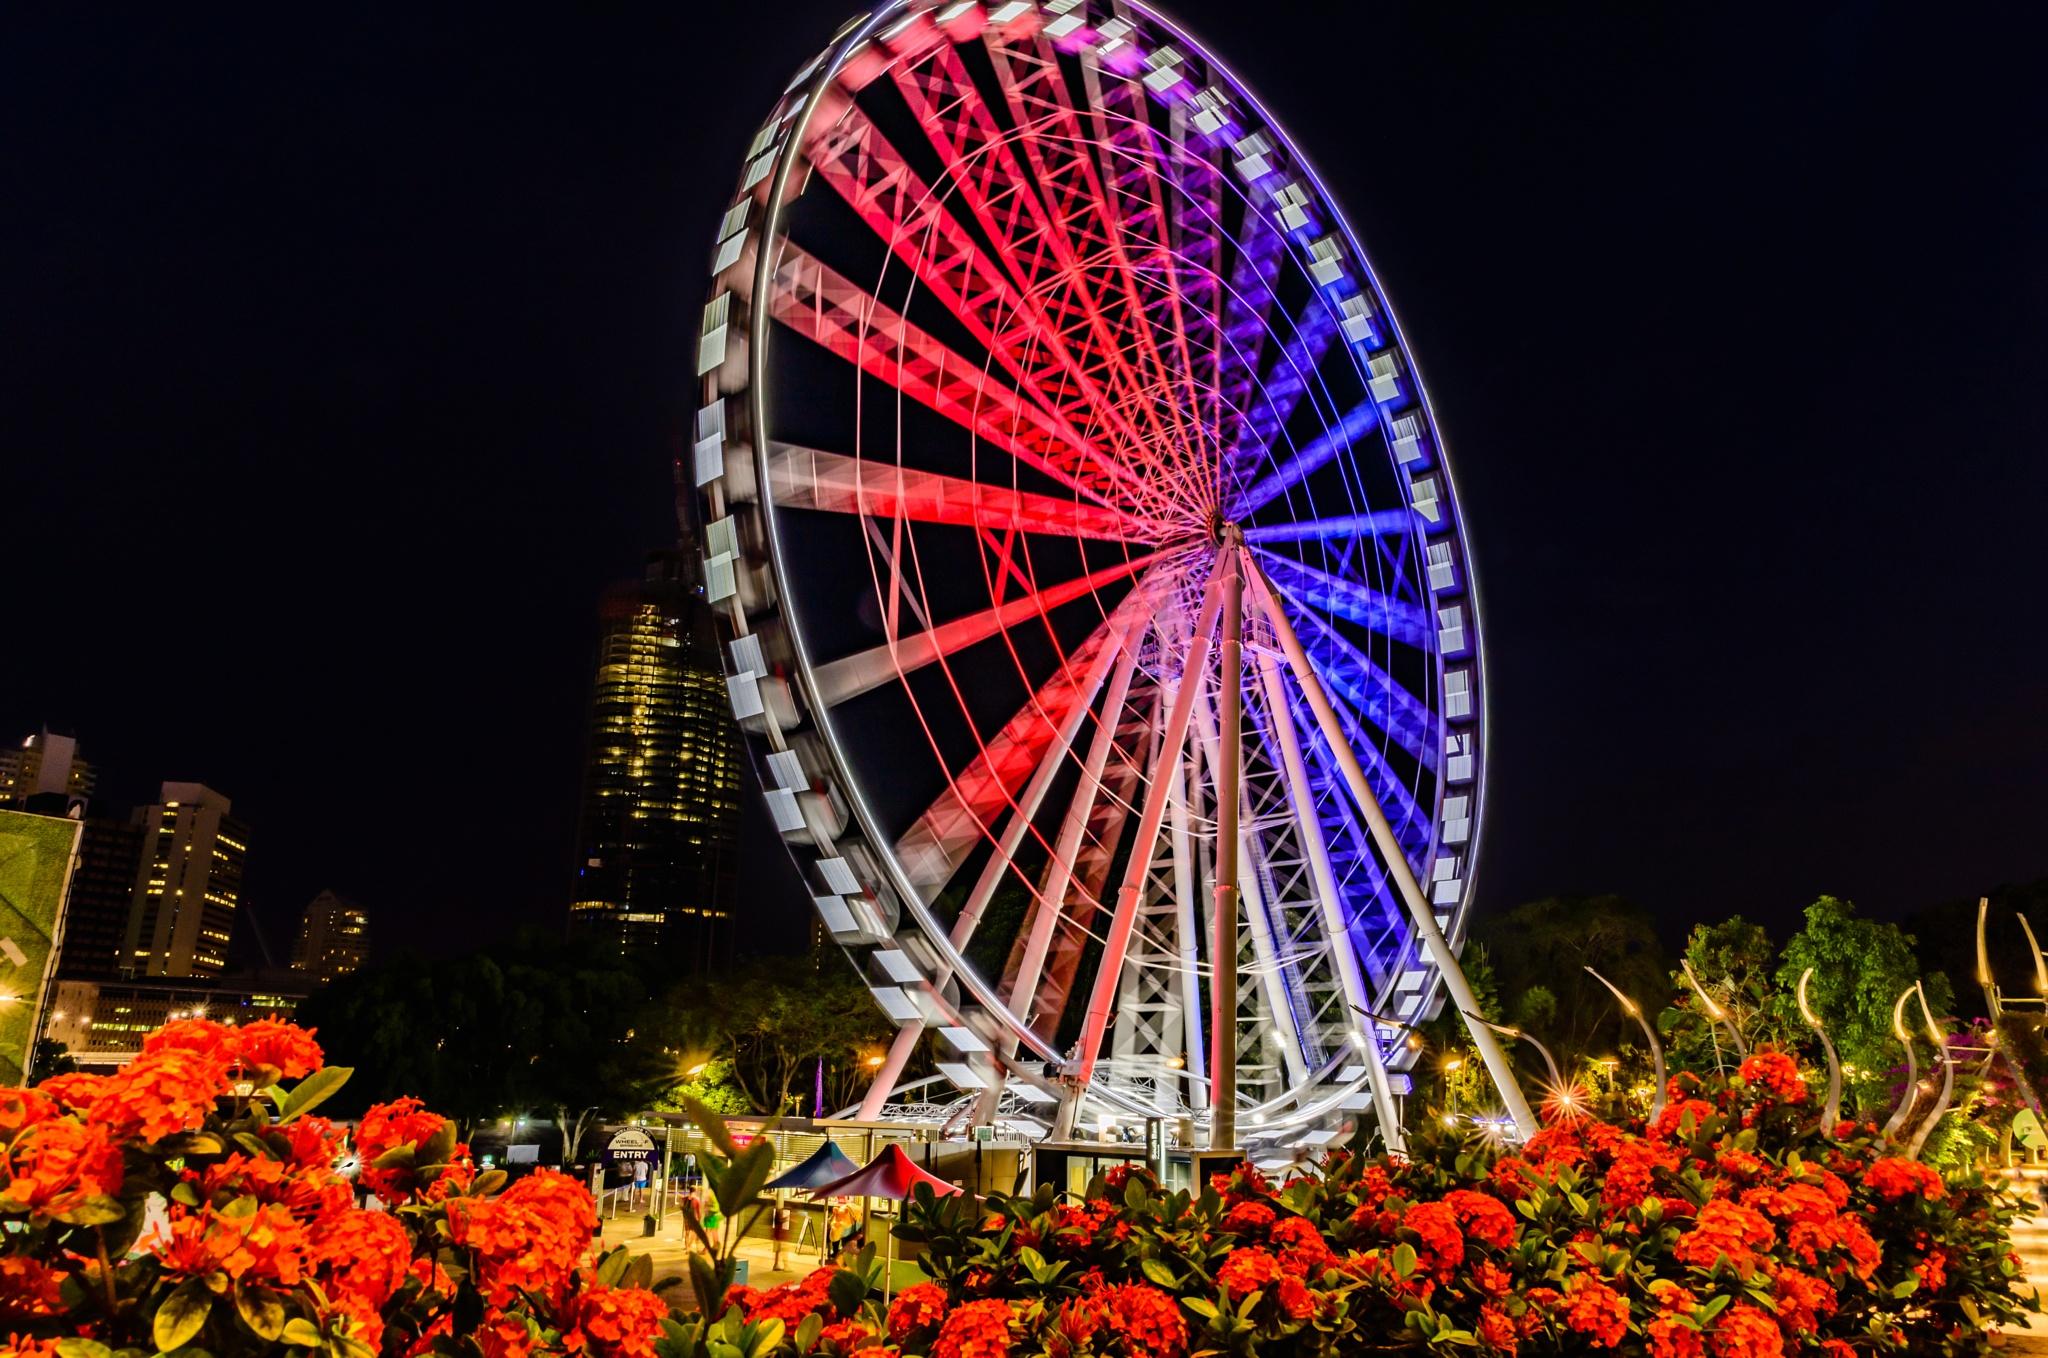 Wheel of Brisbane - Paris Tribute by Mick Glass